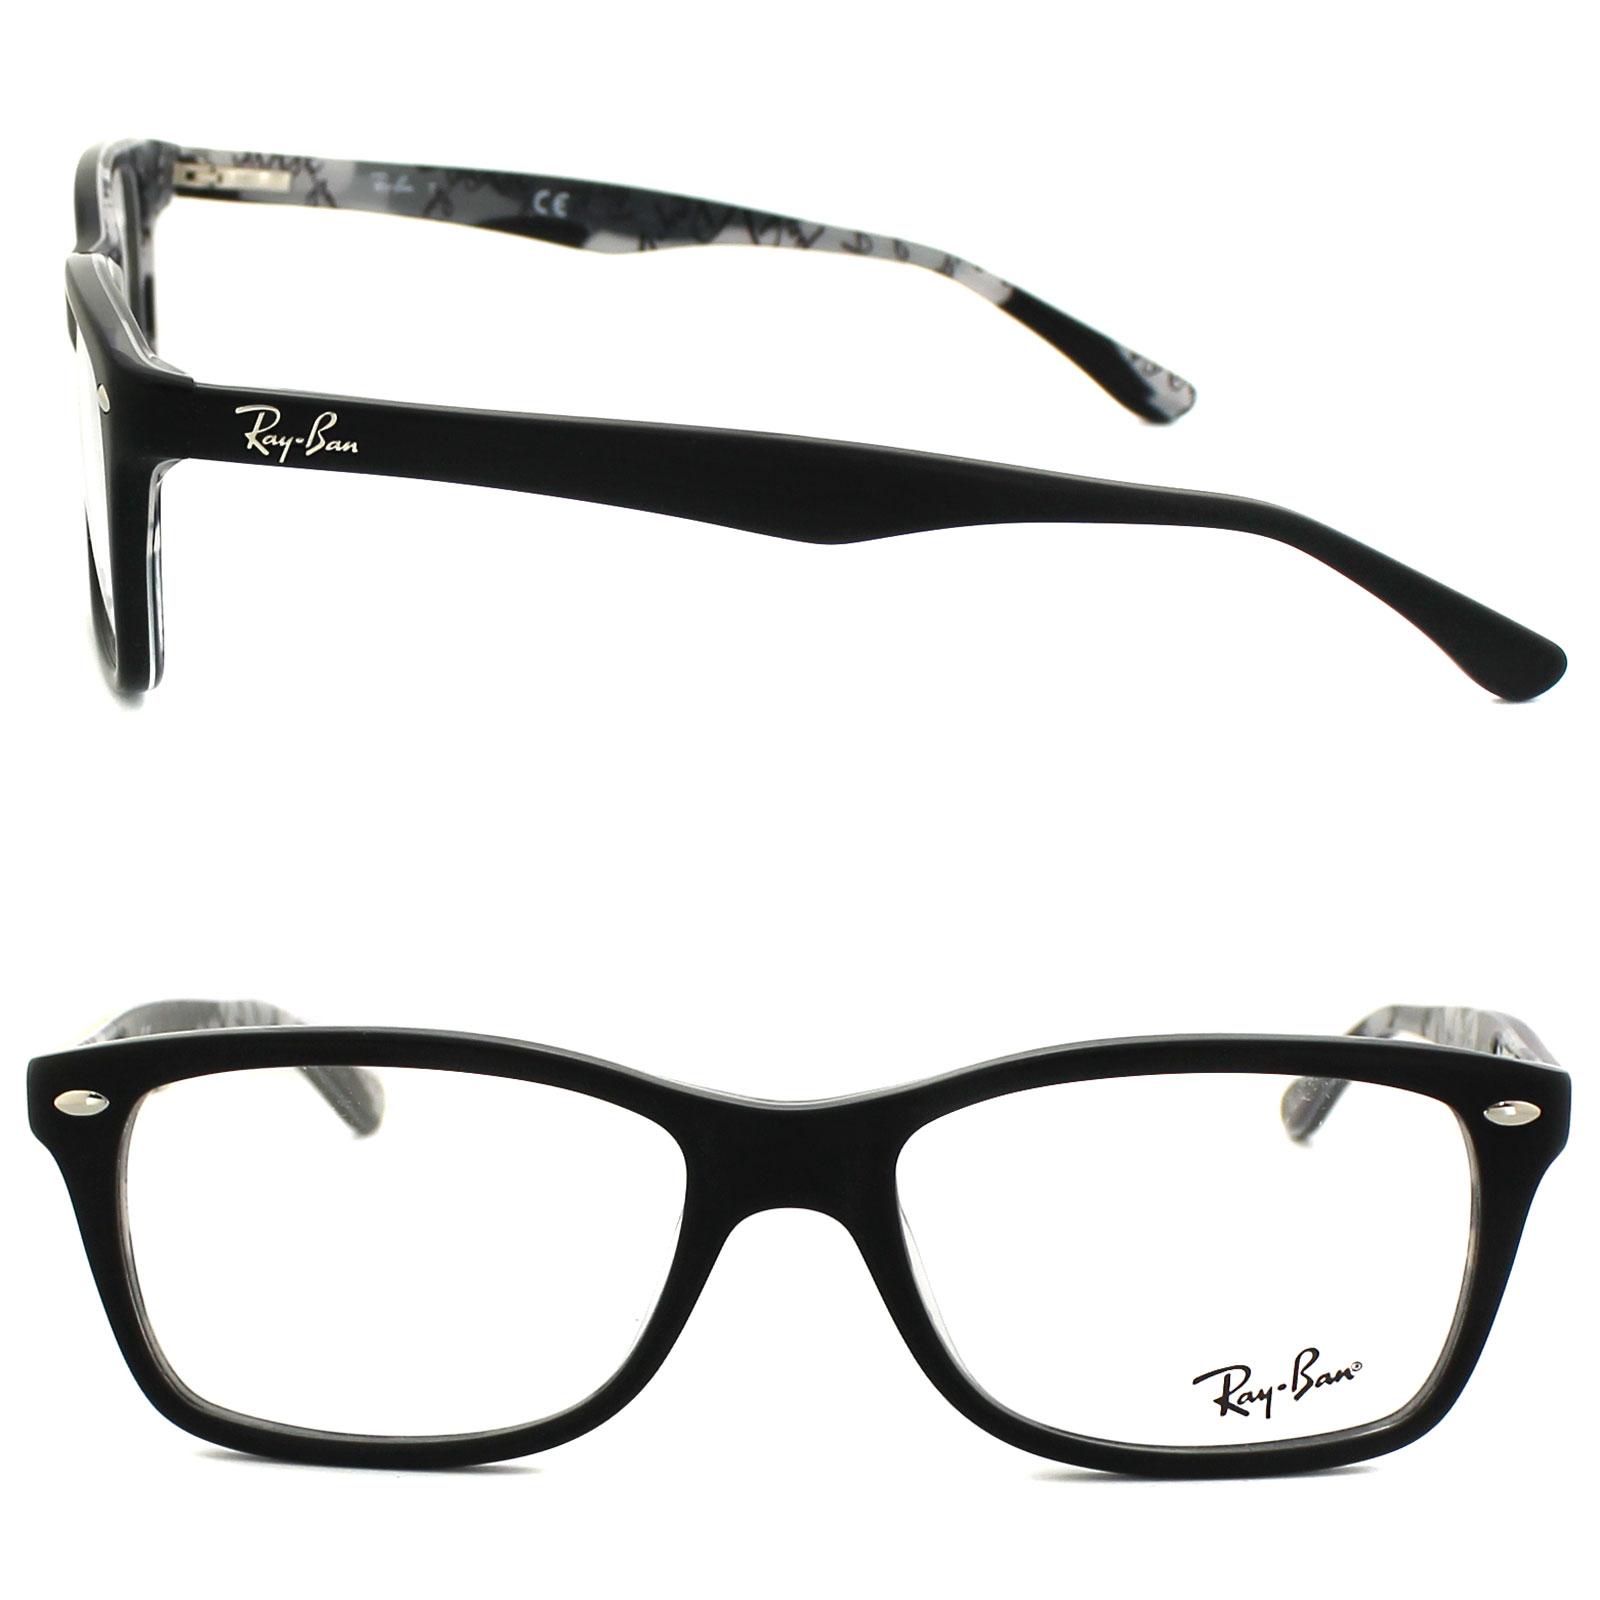 c306e03e94 Sentinel Ray-Ban Glasses Frames 5228 5405 Top Matt Black On Texture  Camouflage 53mm